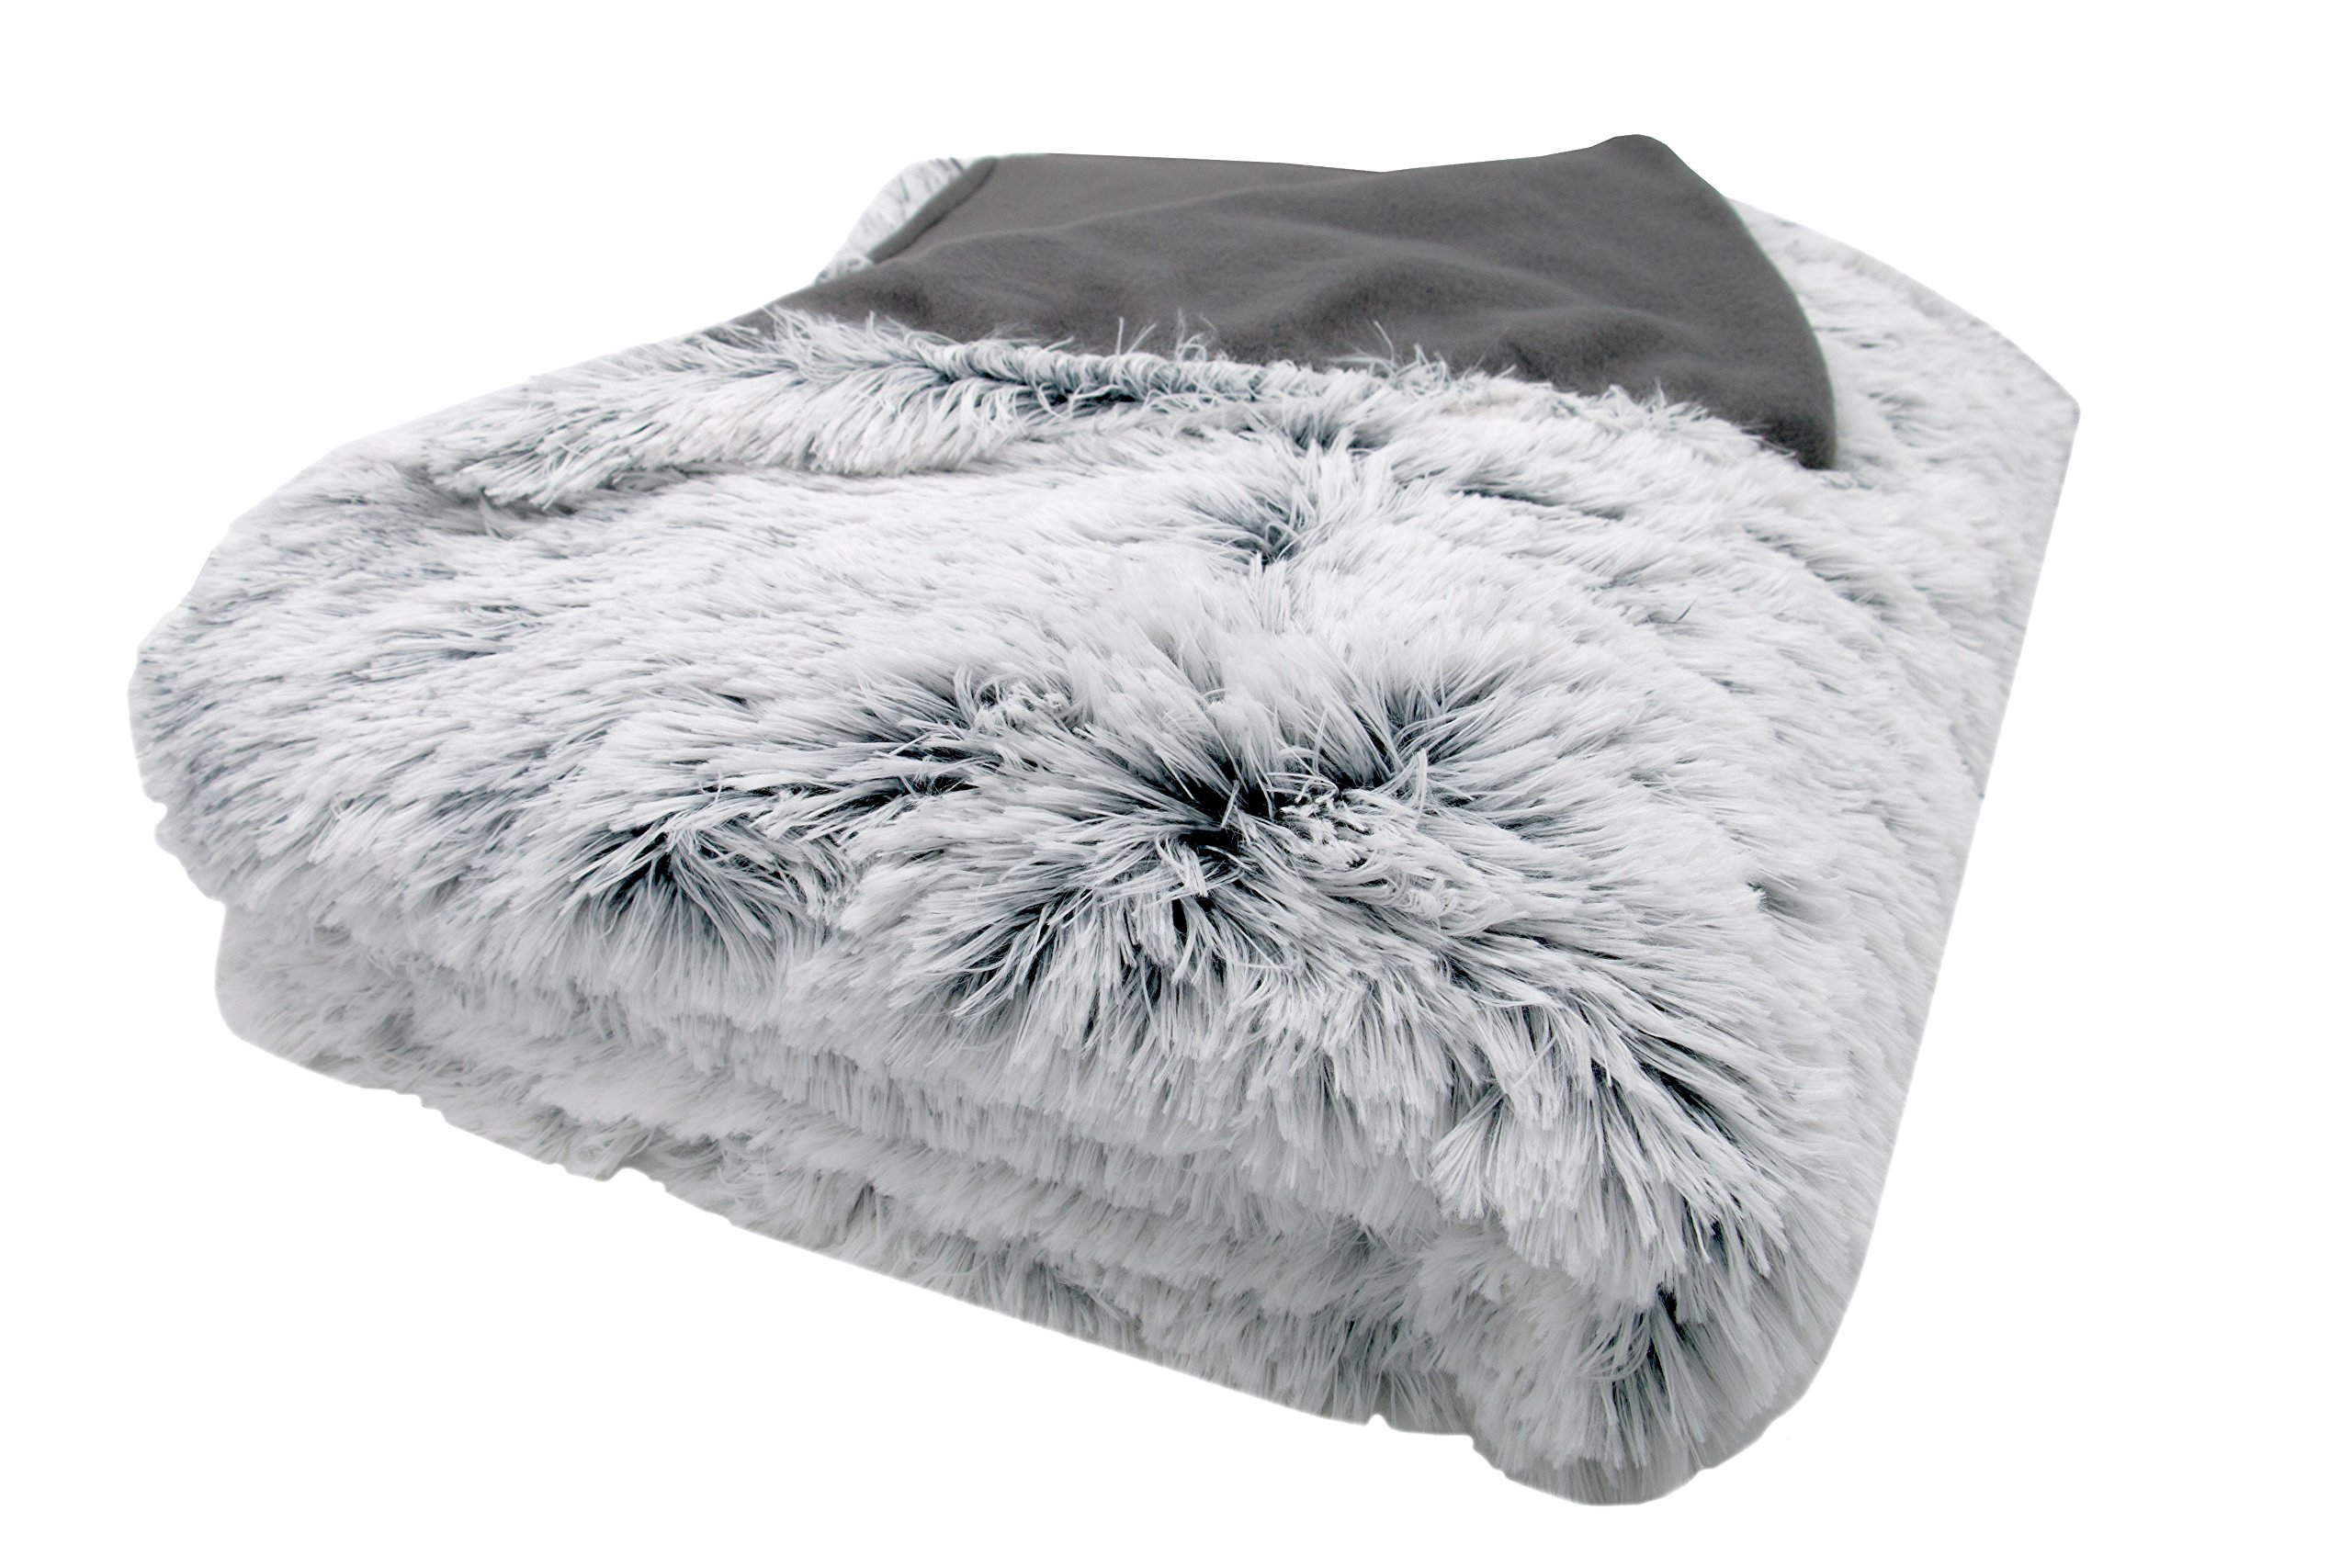 Zollner Kuscheldecke 150x200 cm oder 220x240 cm, grau-weiß, Felloptik, 024